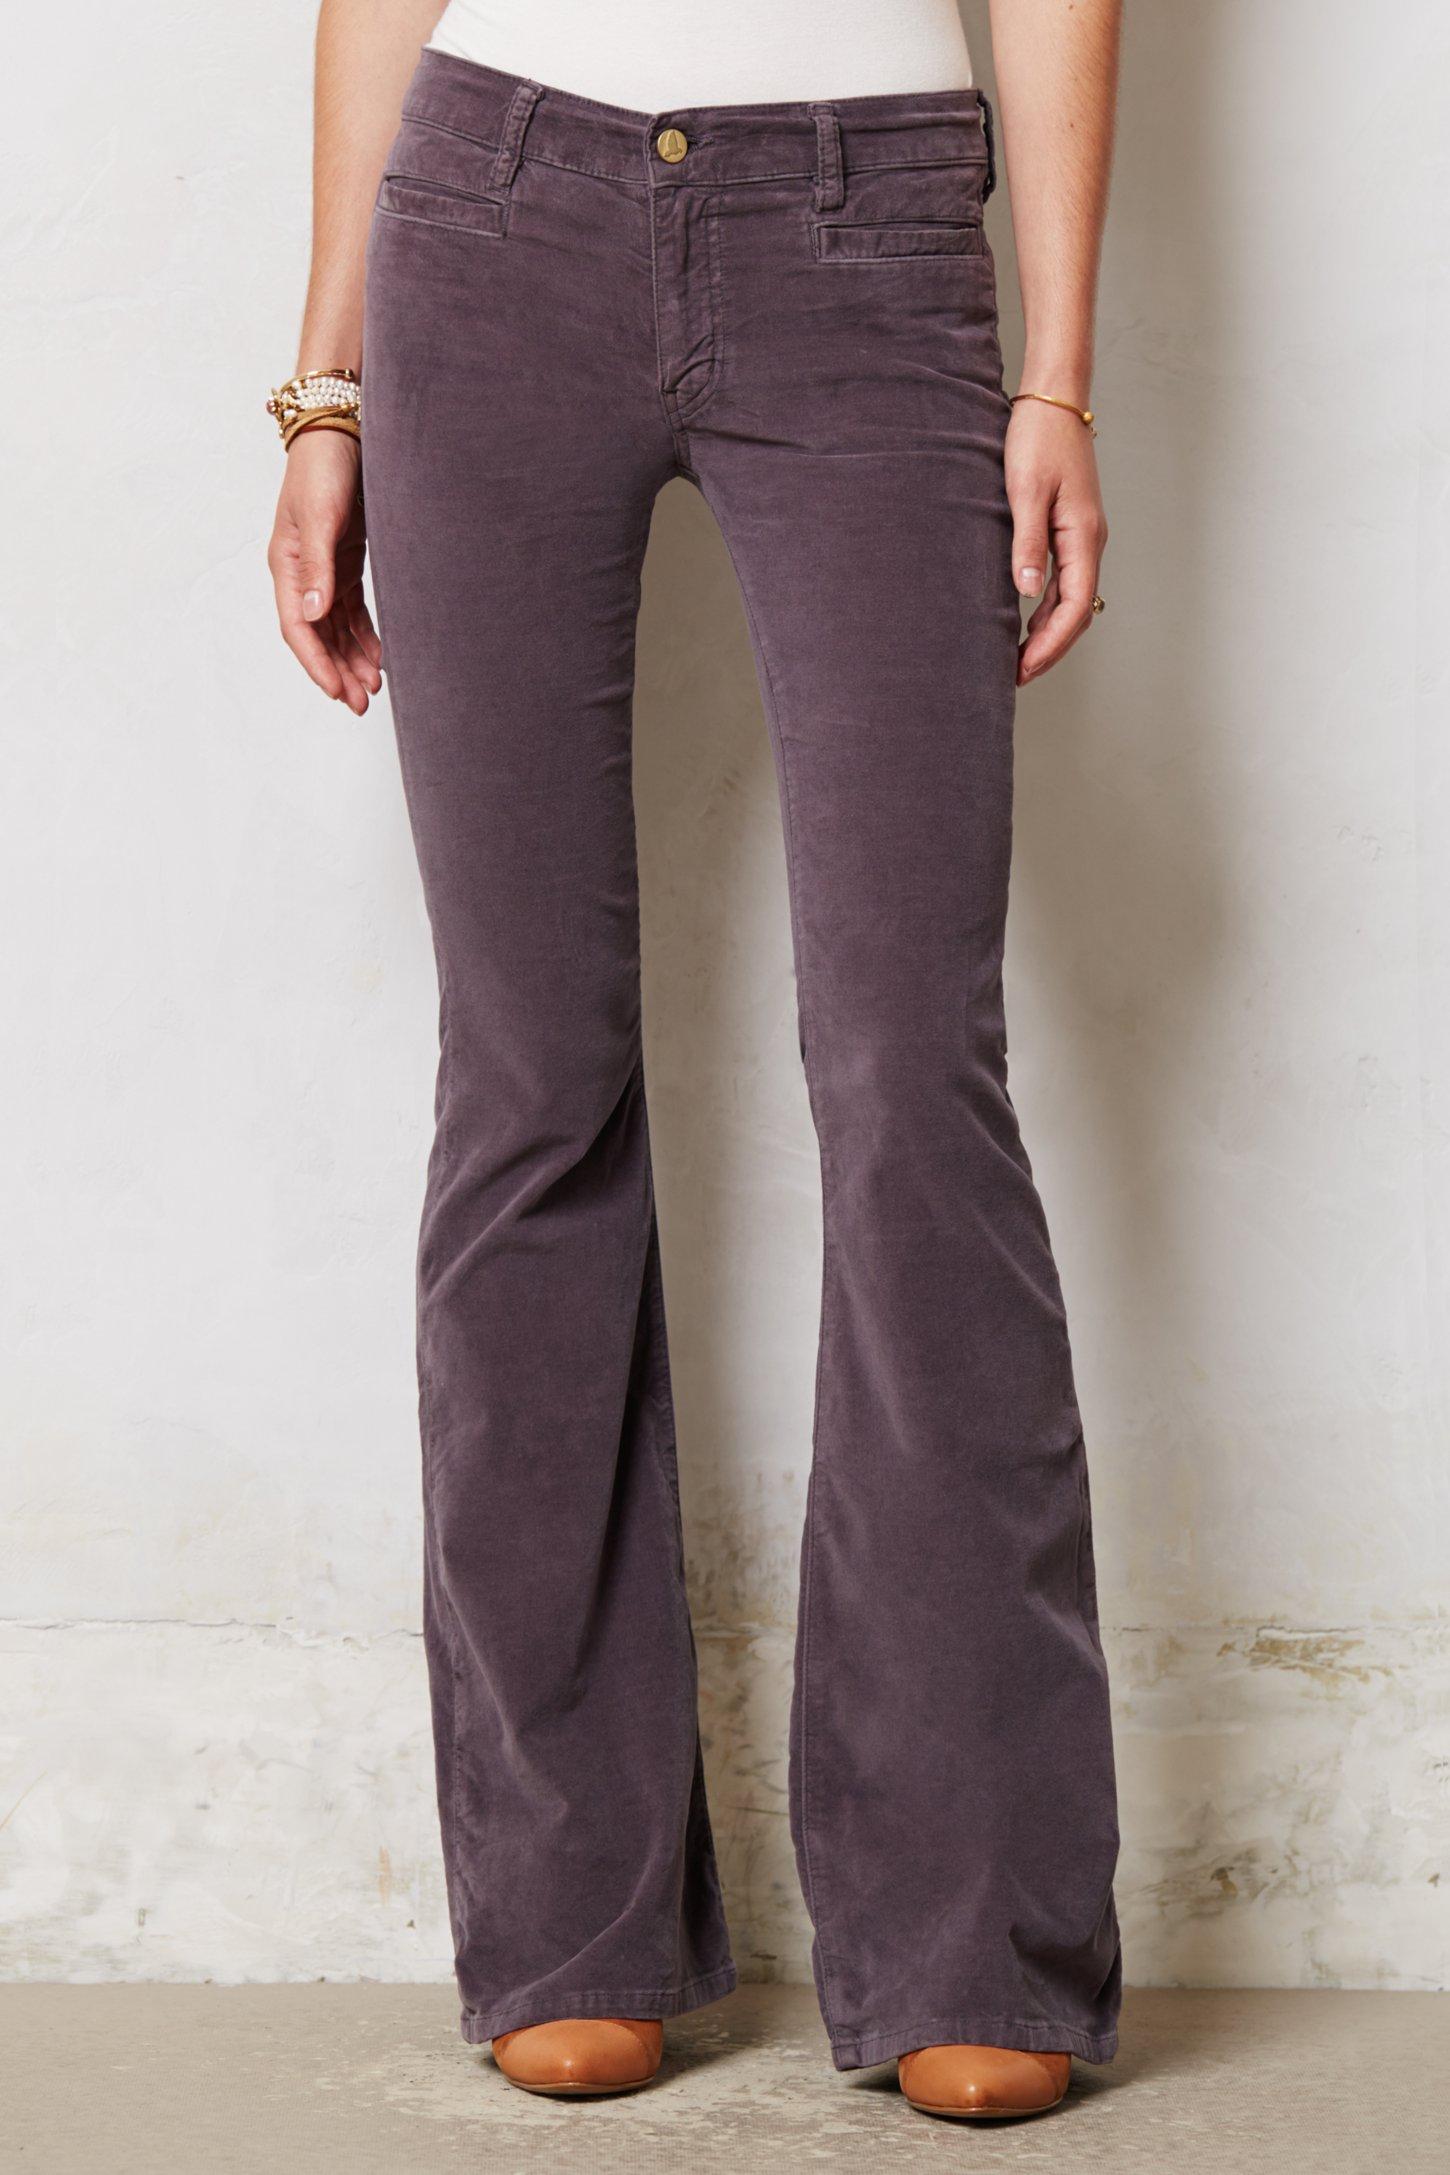 M.i.h jeans Petite Casablanca Flare Jeans in Purple | Lyst